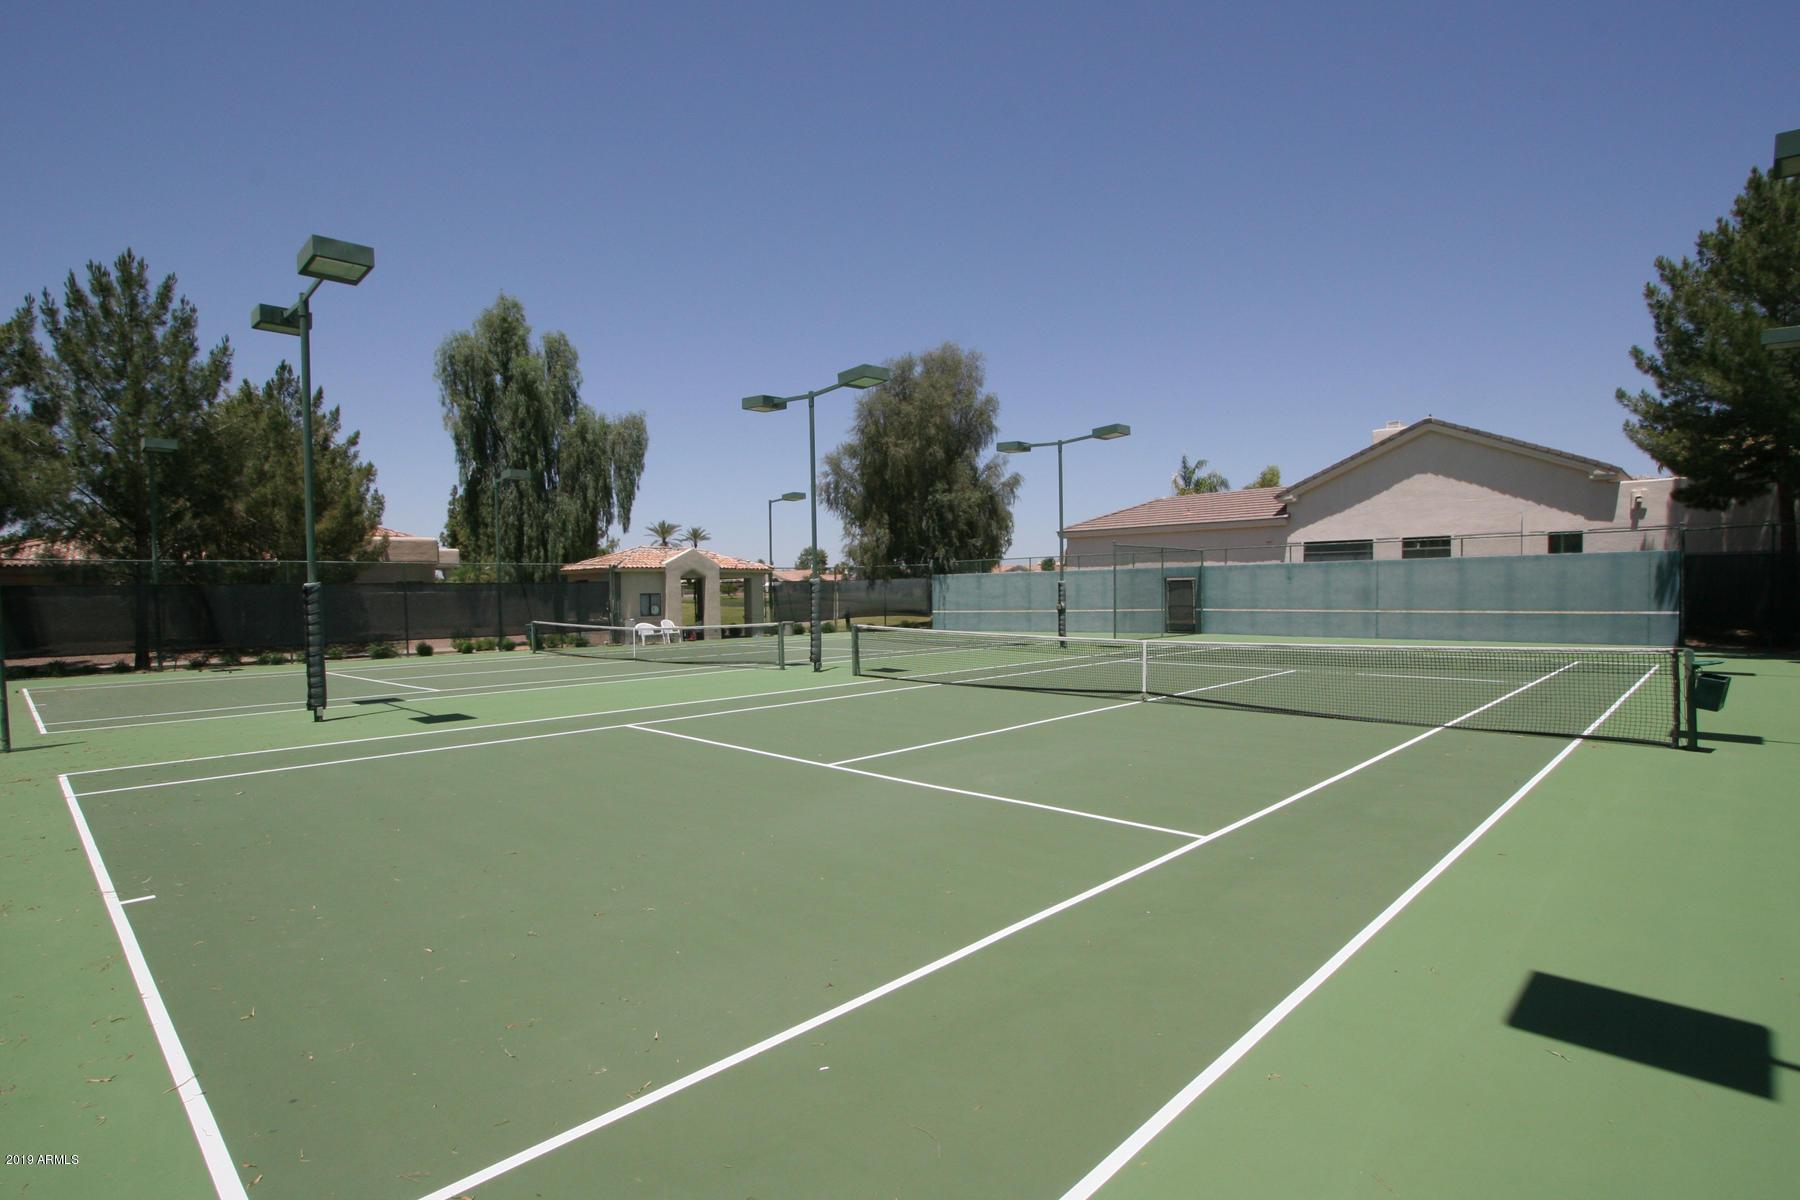 MLS 5930863 8260 E KALIL Drive, Scottsdale, AZ 85260 Scottsdale AZ Scottsdale Country Club